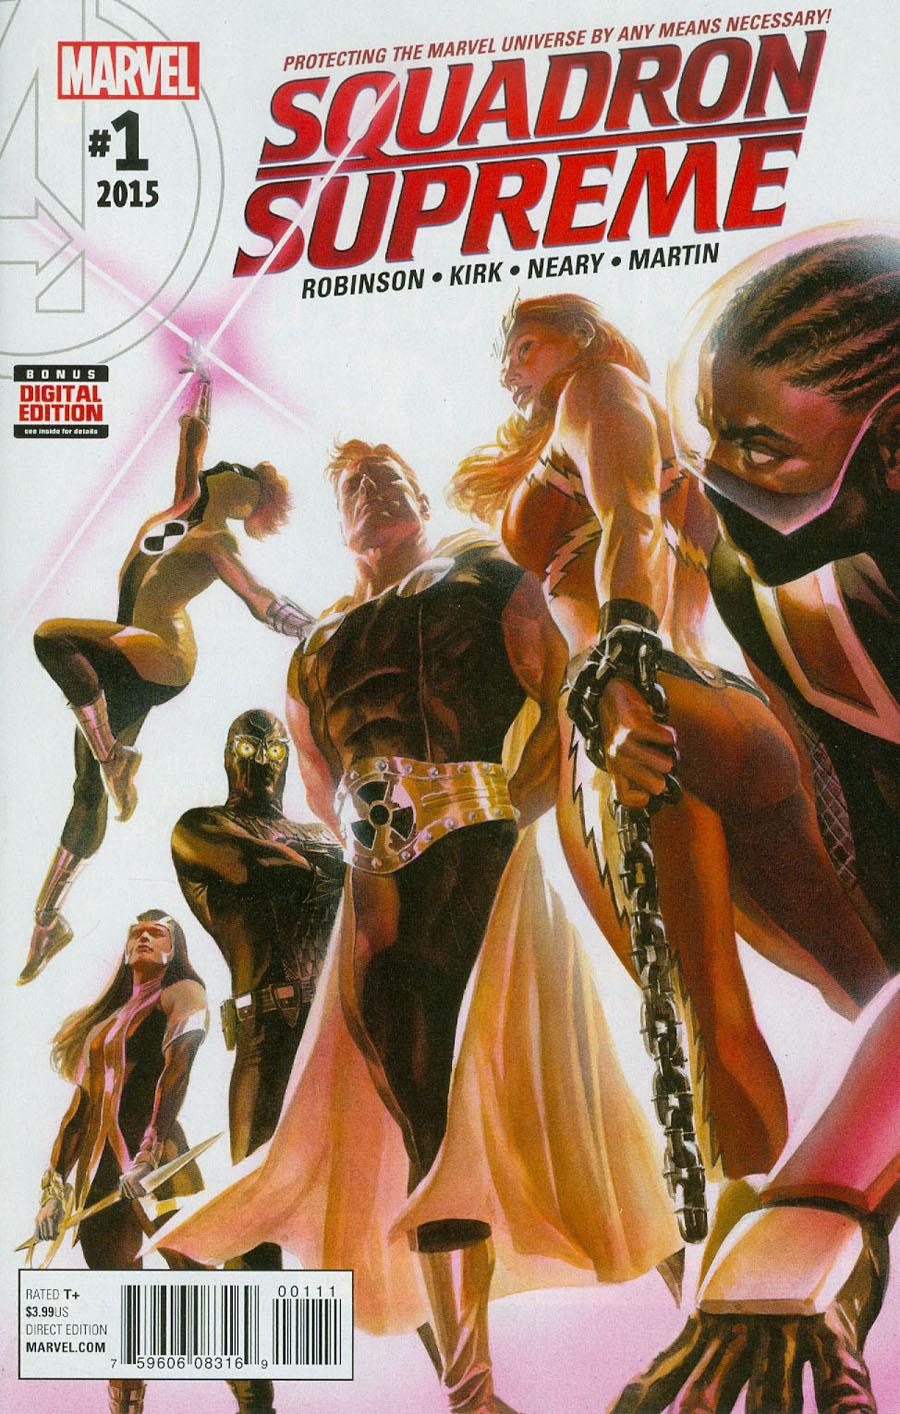 Squadron Supreme Vol 4 #1 Cover A 1st Ptg Regular Alex Ross Cover